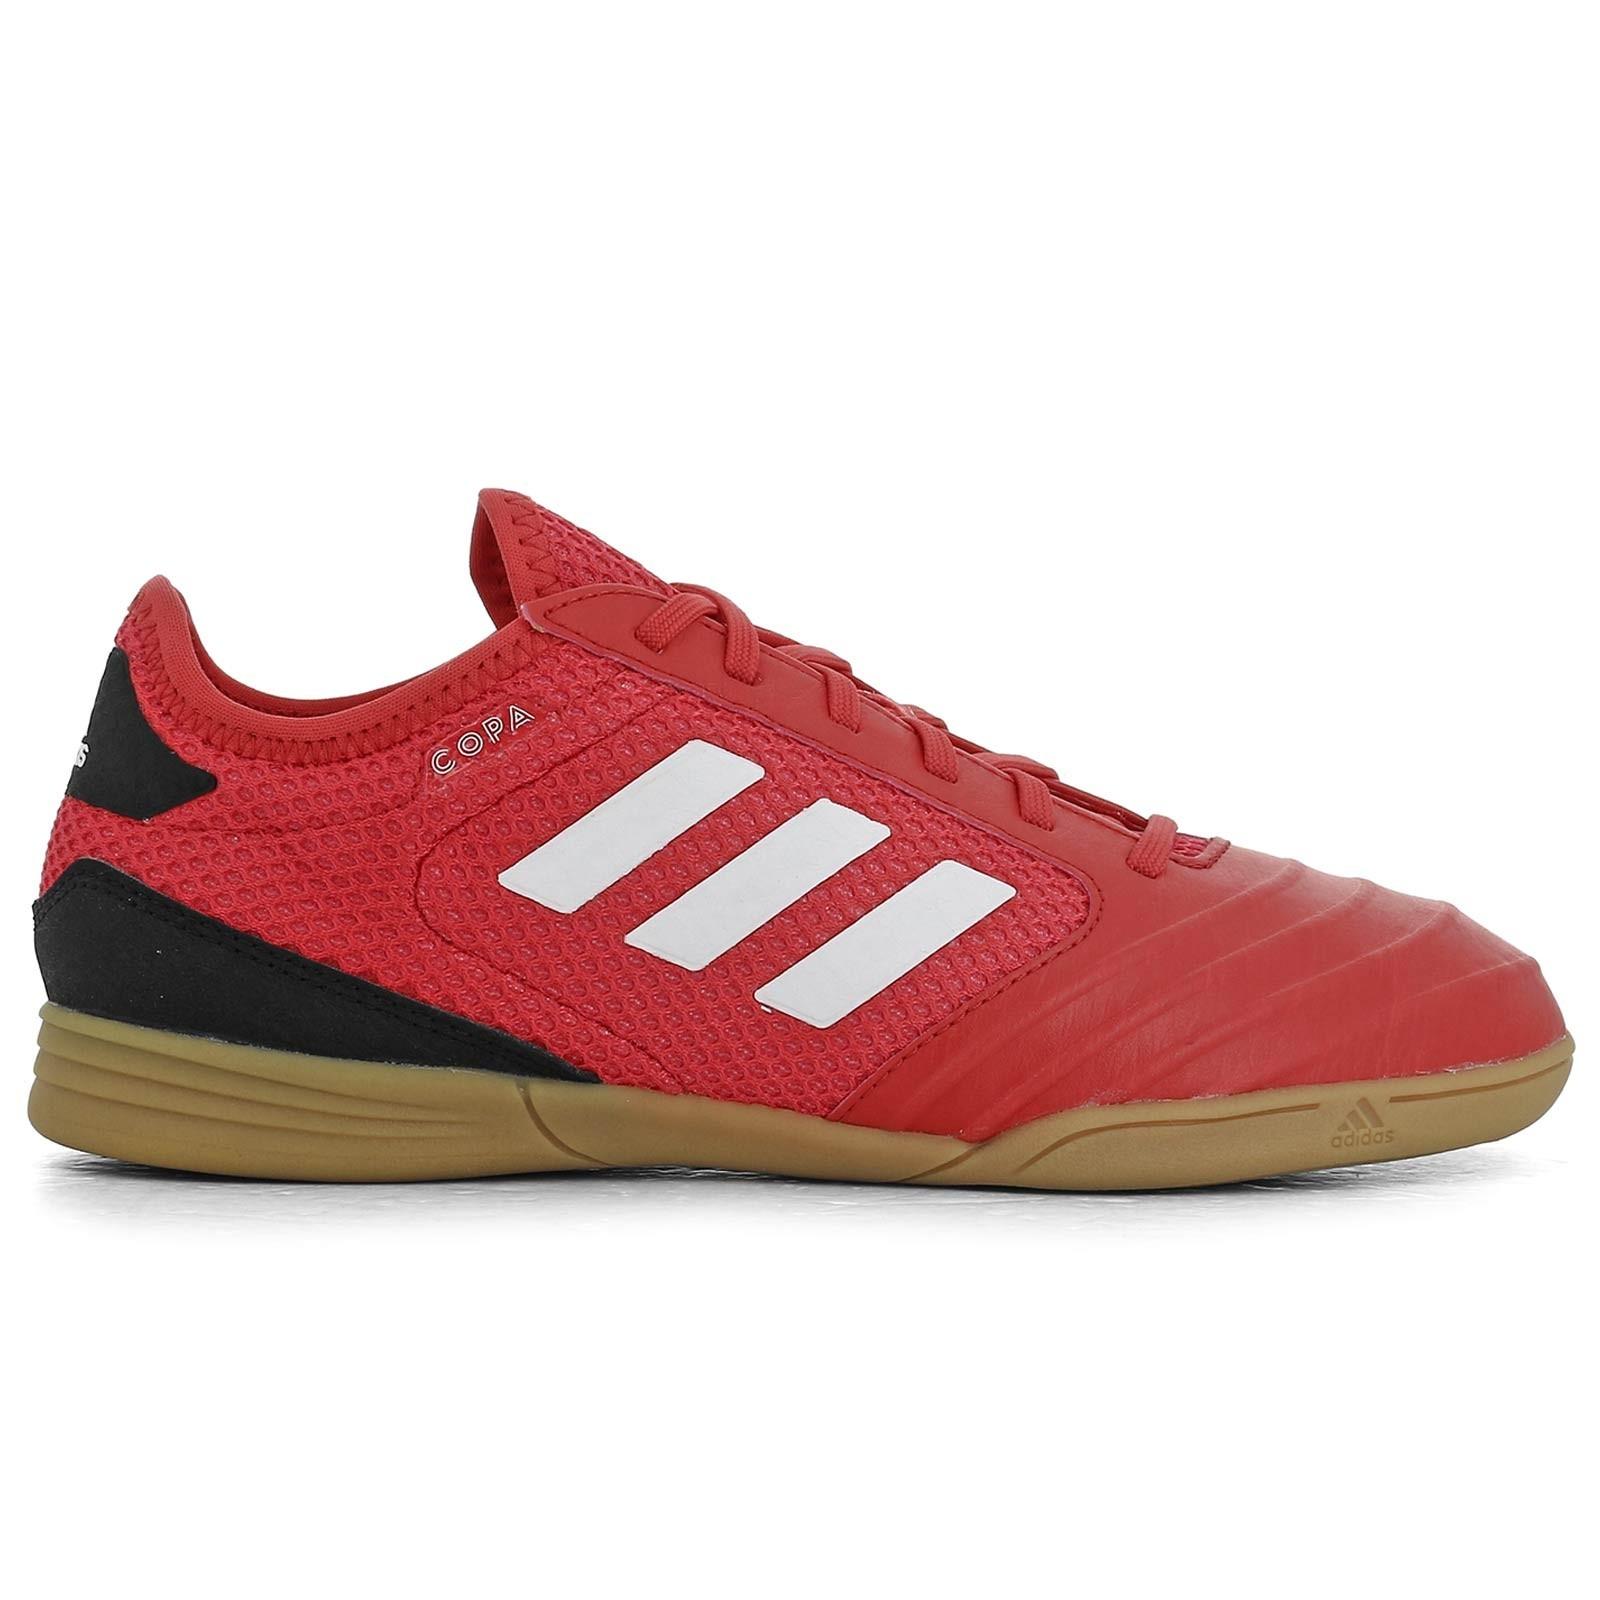 buy online 6c83b 66bfd Zapatillas Fútbol Sala adidas Copa Tango 18.3 Sala J B22516 - Deportes  Manzanedo